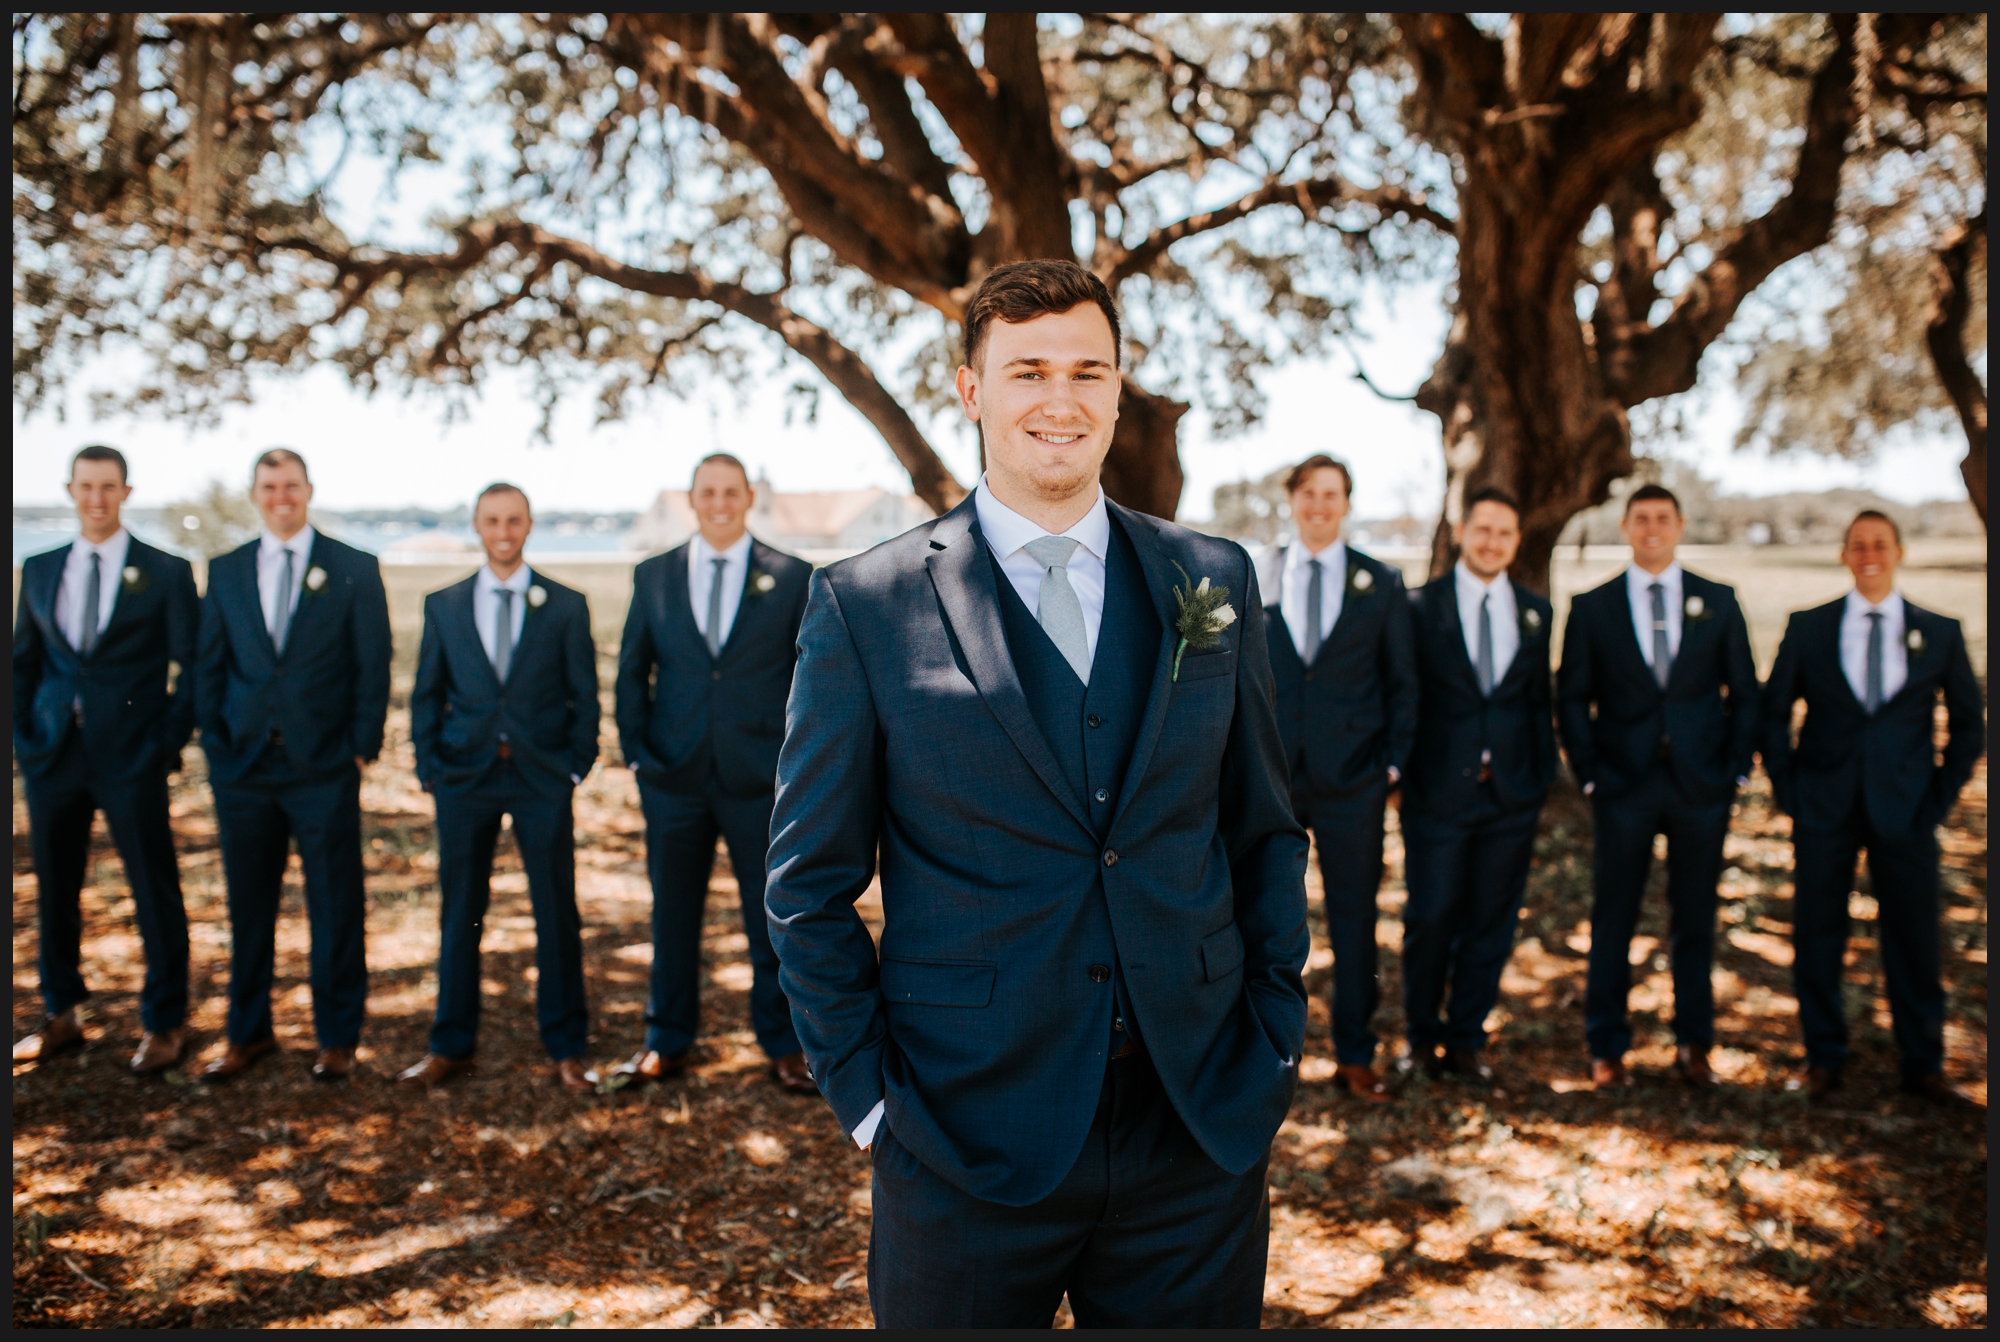 Orlando-Wedding-Photographer-destination-wedding-photographer-florida-wedding-photographer-bohemian-wedding-photographer_0040.jpg